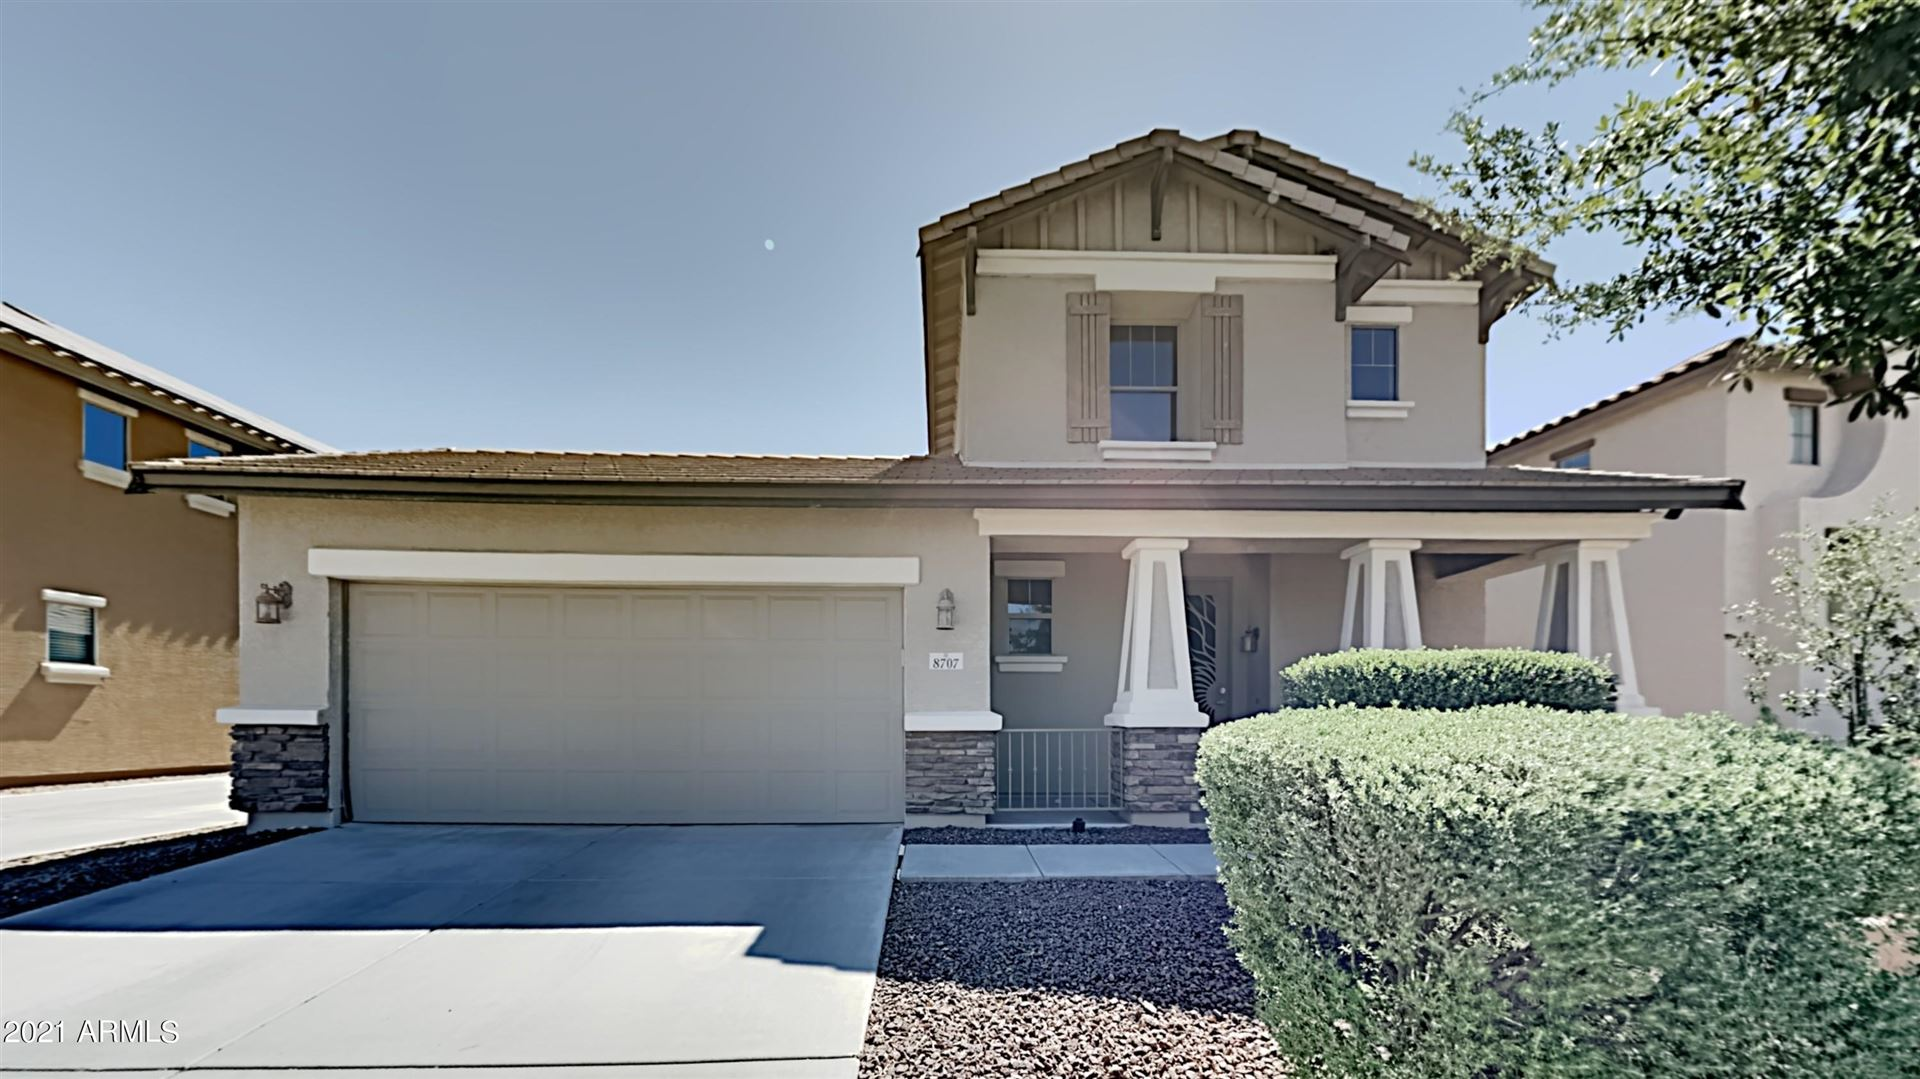 Photo of 8707 S 40TH Drive, Laveen, AZ 85339 (MLS # 6227059)